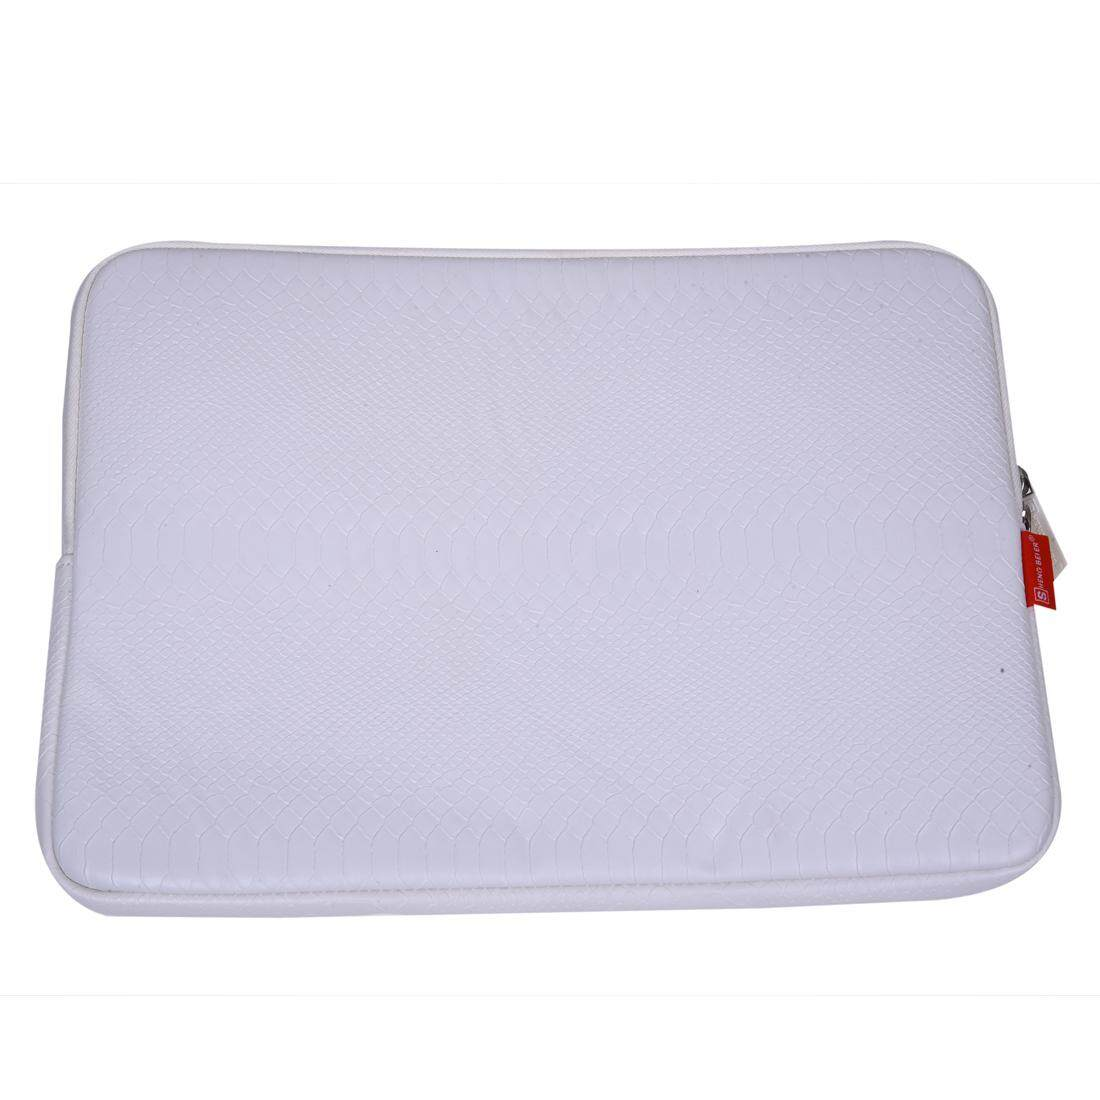 SHENG BEI ER Snake Skin Leather Sleeve Case 15 inch Laptop Bag,For MacBook Notebook Case Air Pro(White) - intl